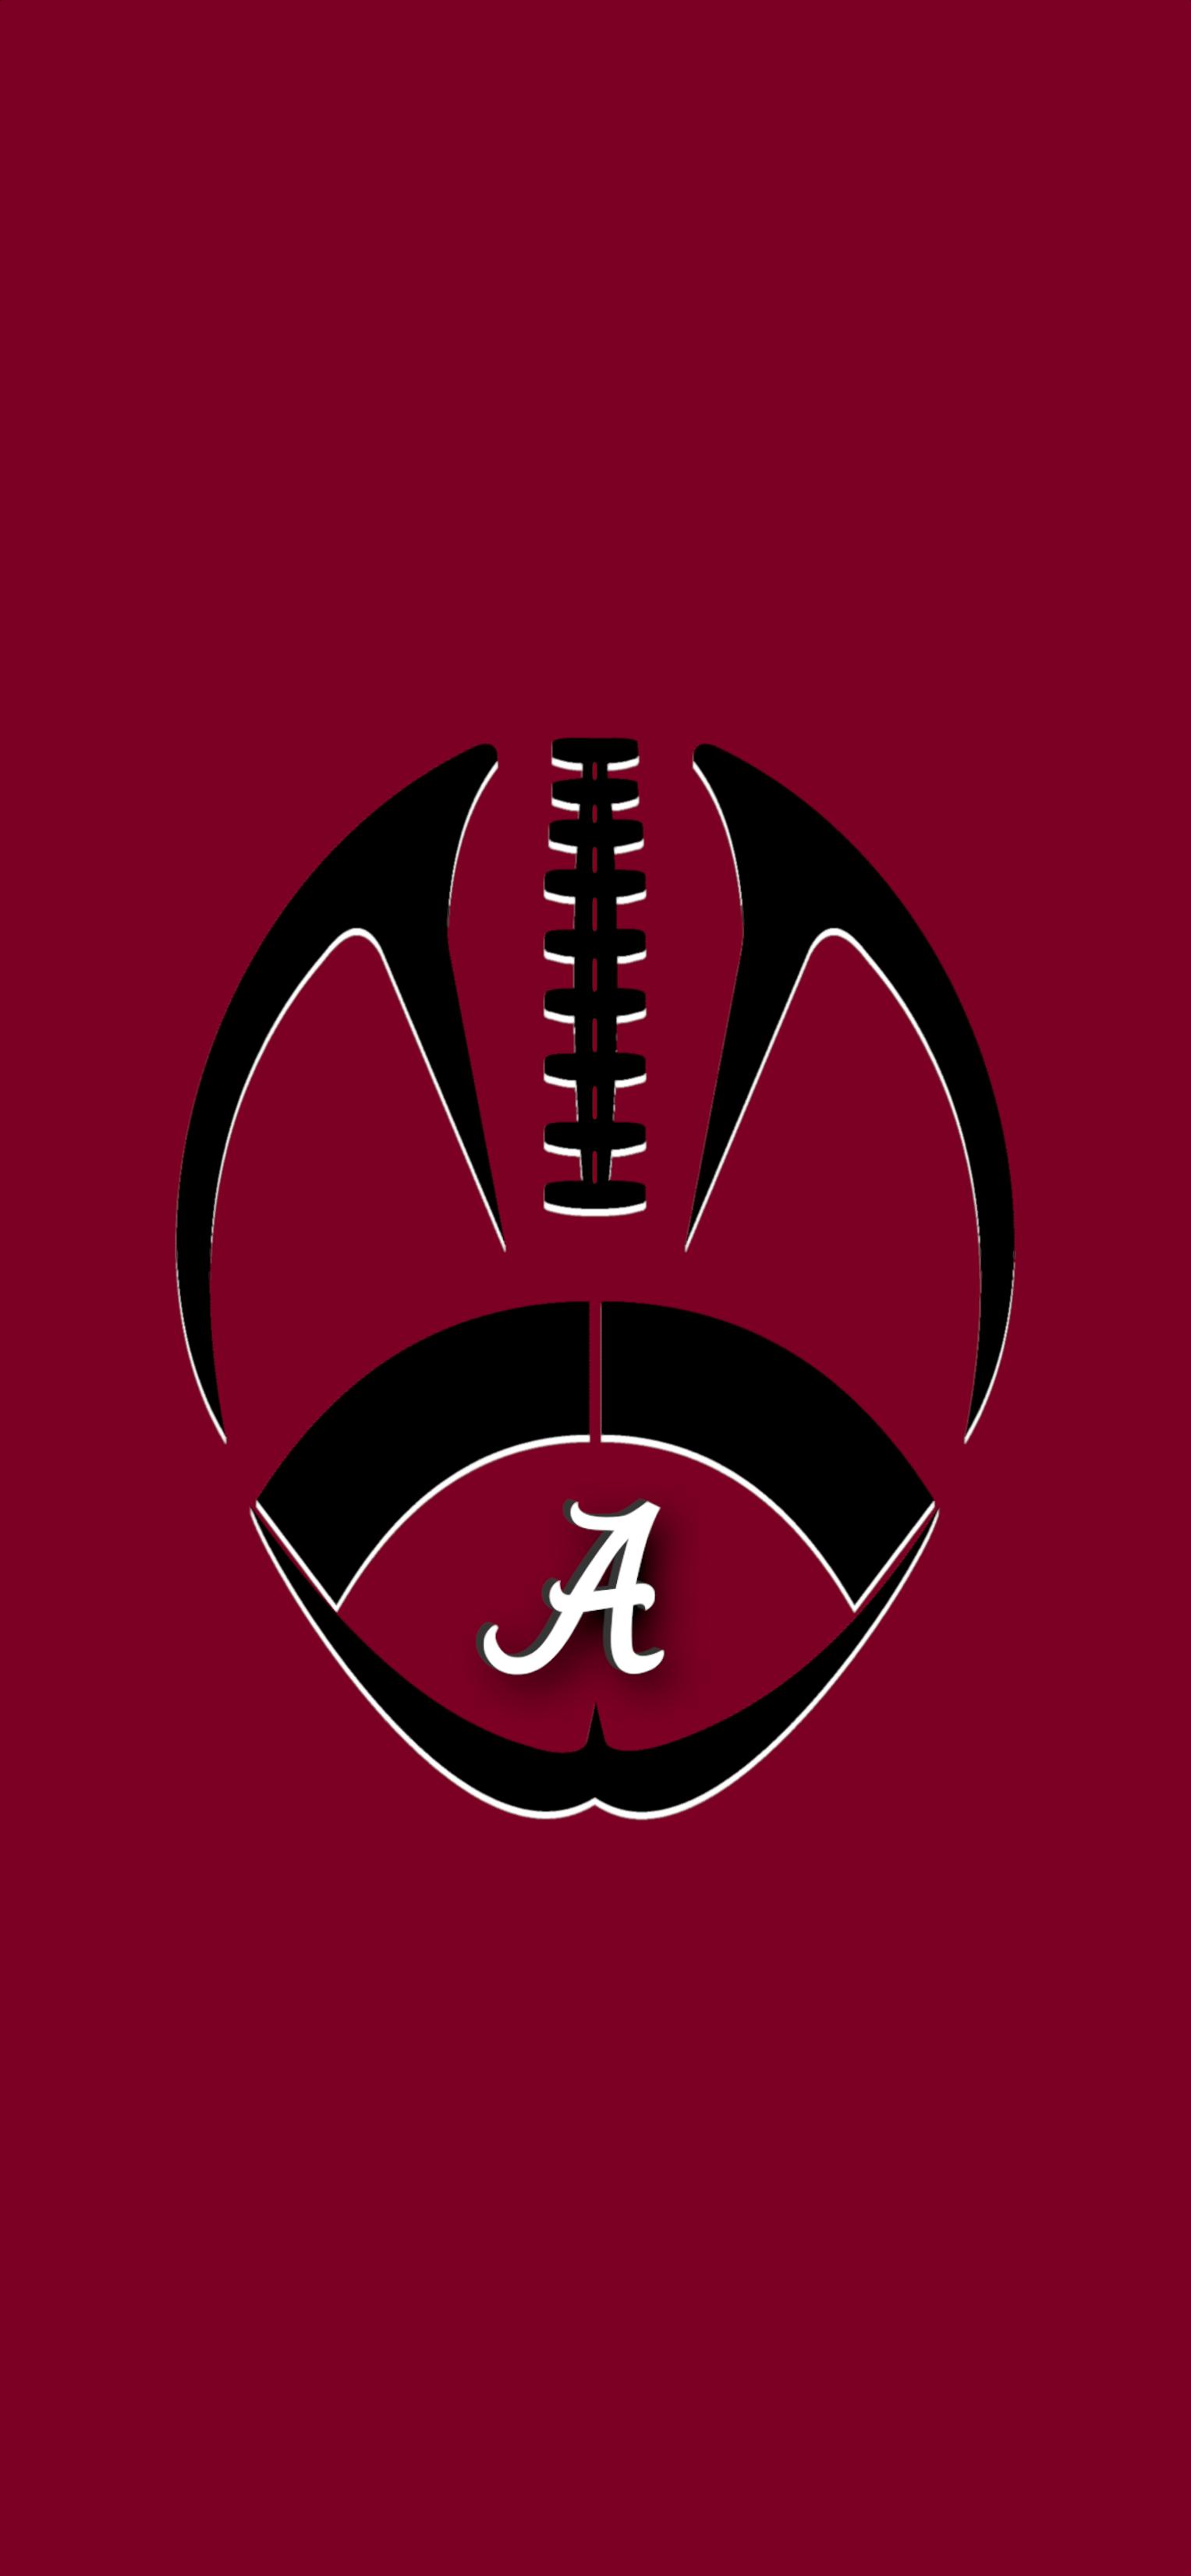 Bama Football 2 Alabama Crimson Tide Logo Alabama Crimson Tide Crimson Tide Football